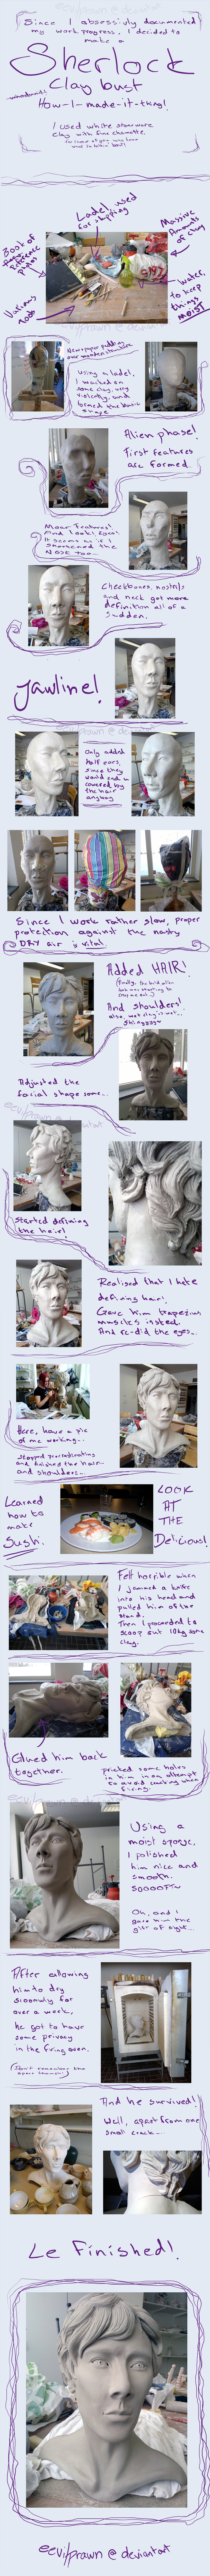 Sherlock: Work Progress by perpetualperversions